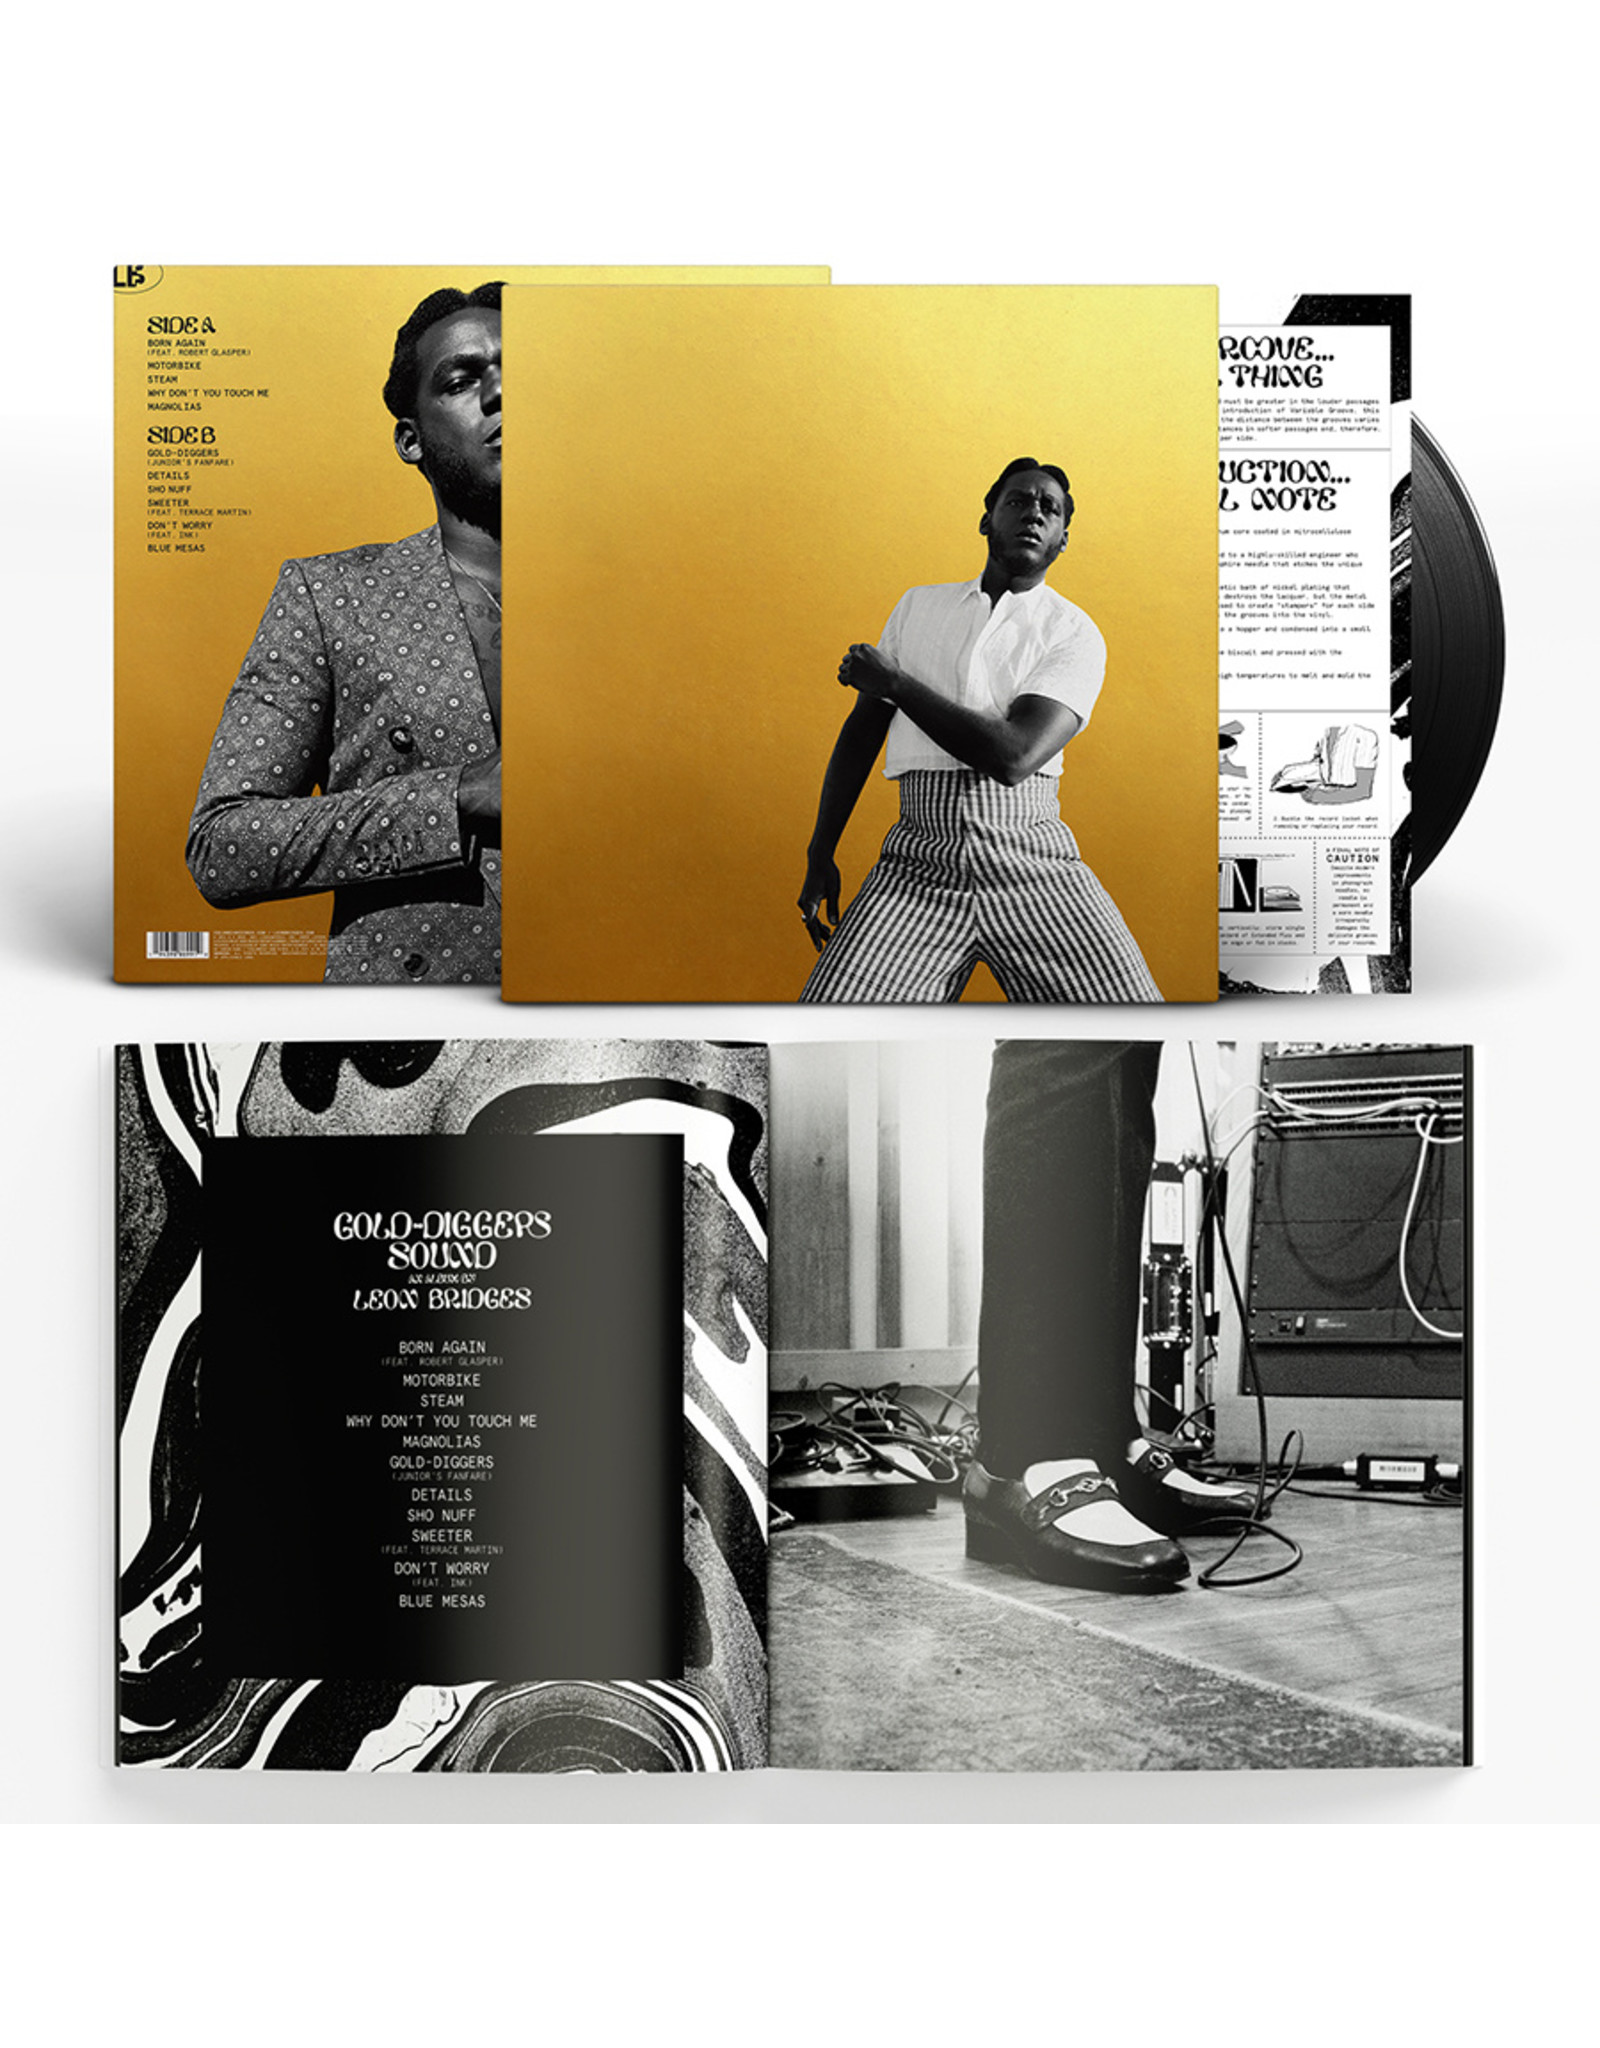 Leon Bridges - Gold-Diggers Sound (Exclusive Alternate Cover)